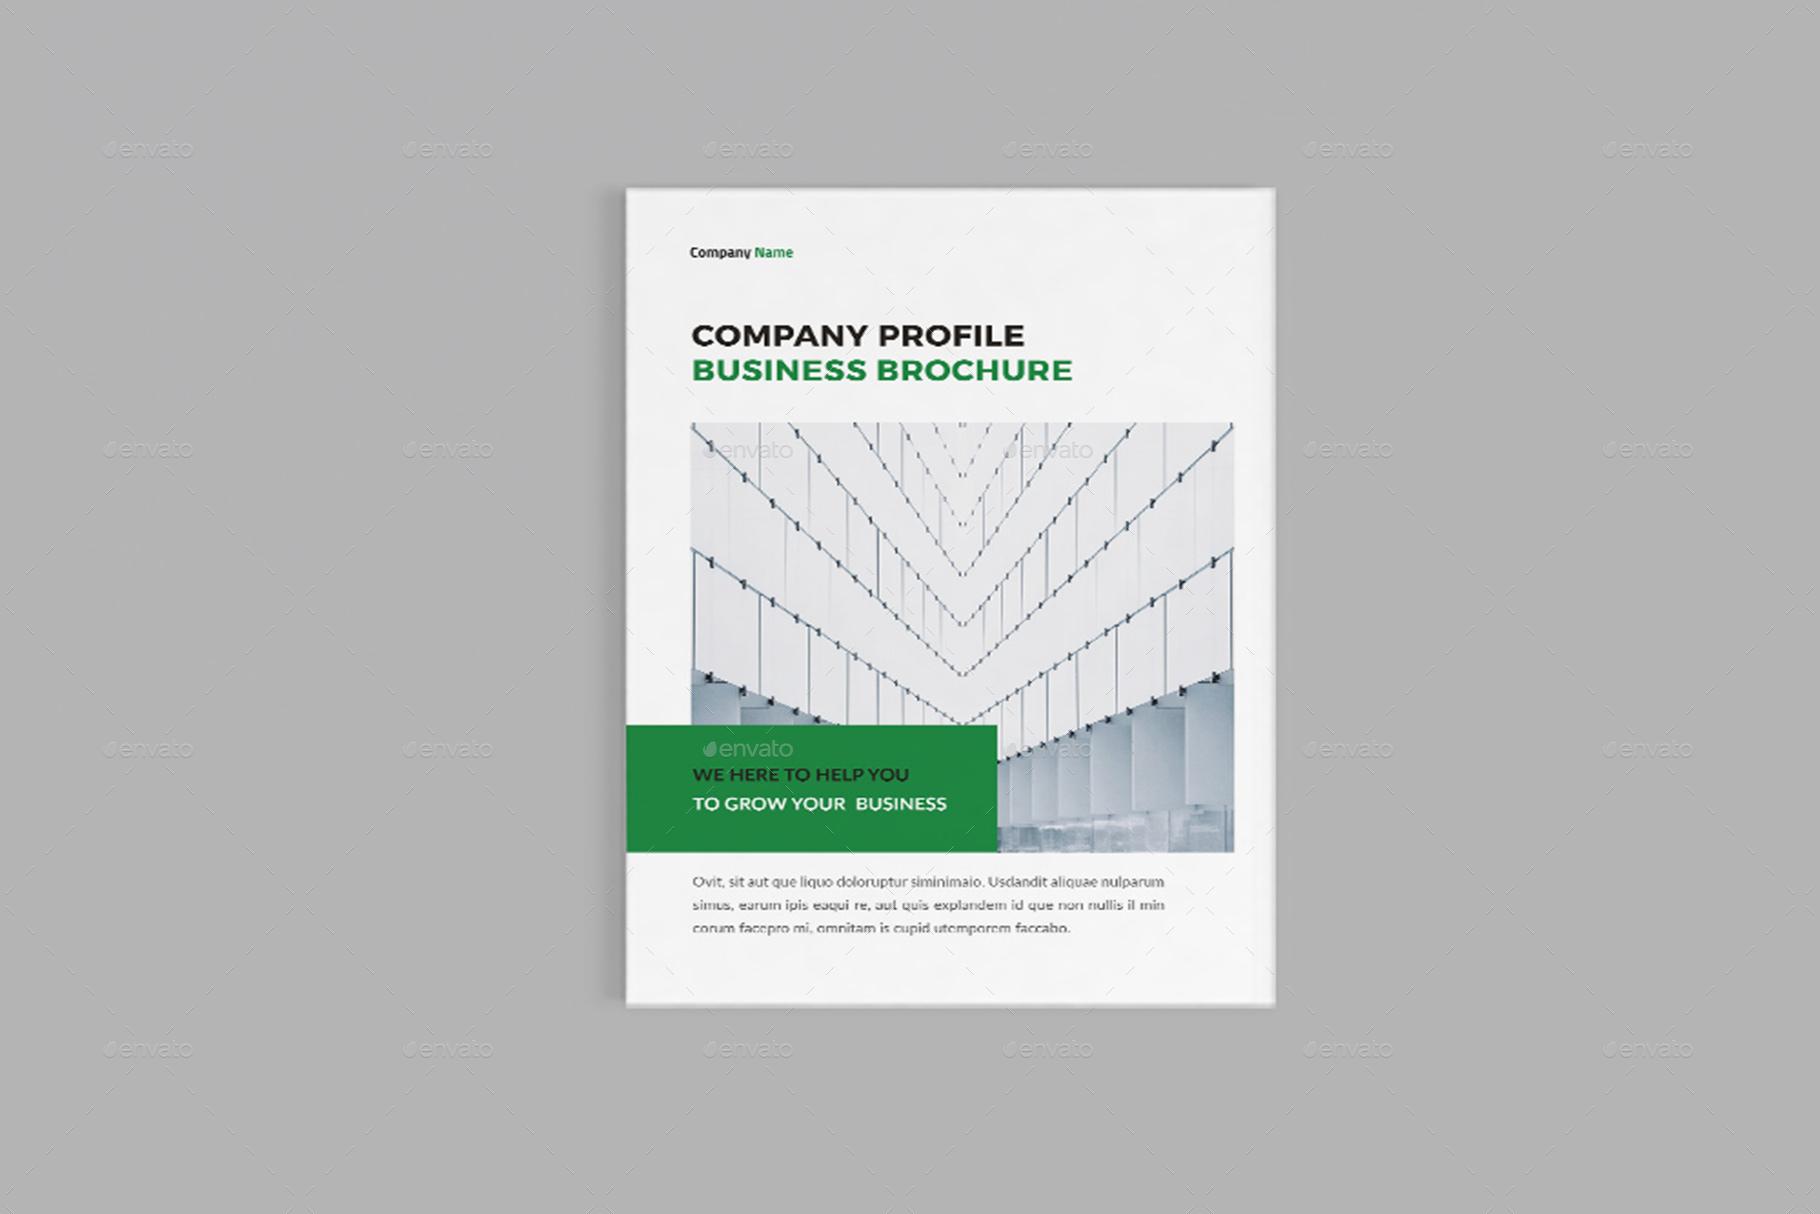 Corpora - A4 Company Profile Brochure Template